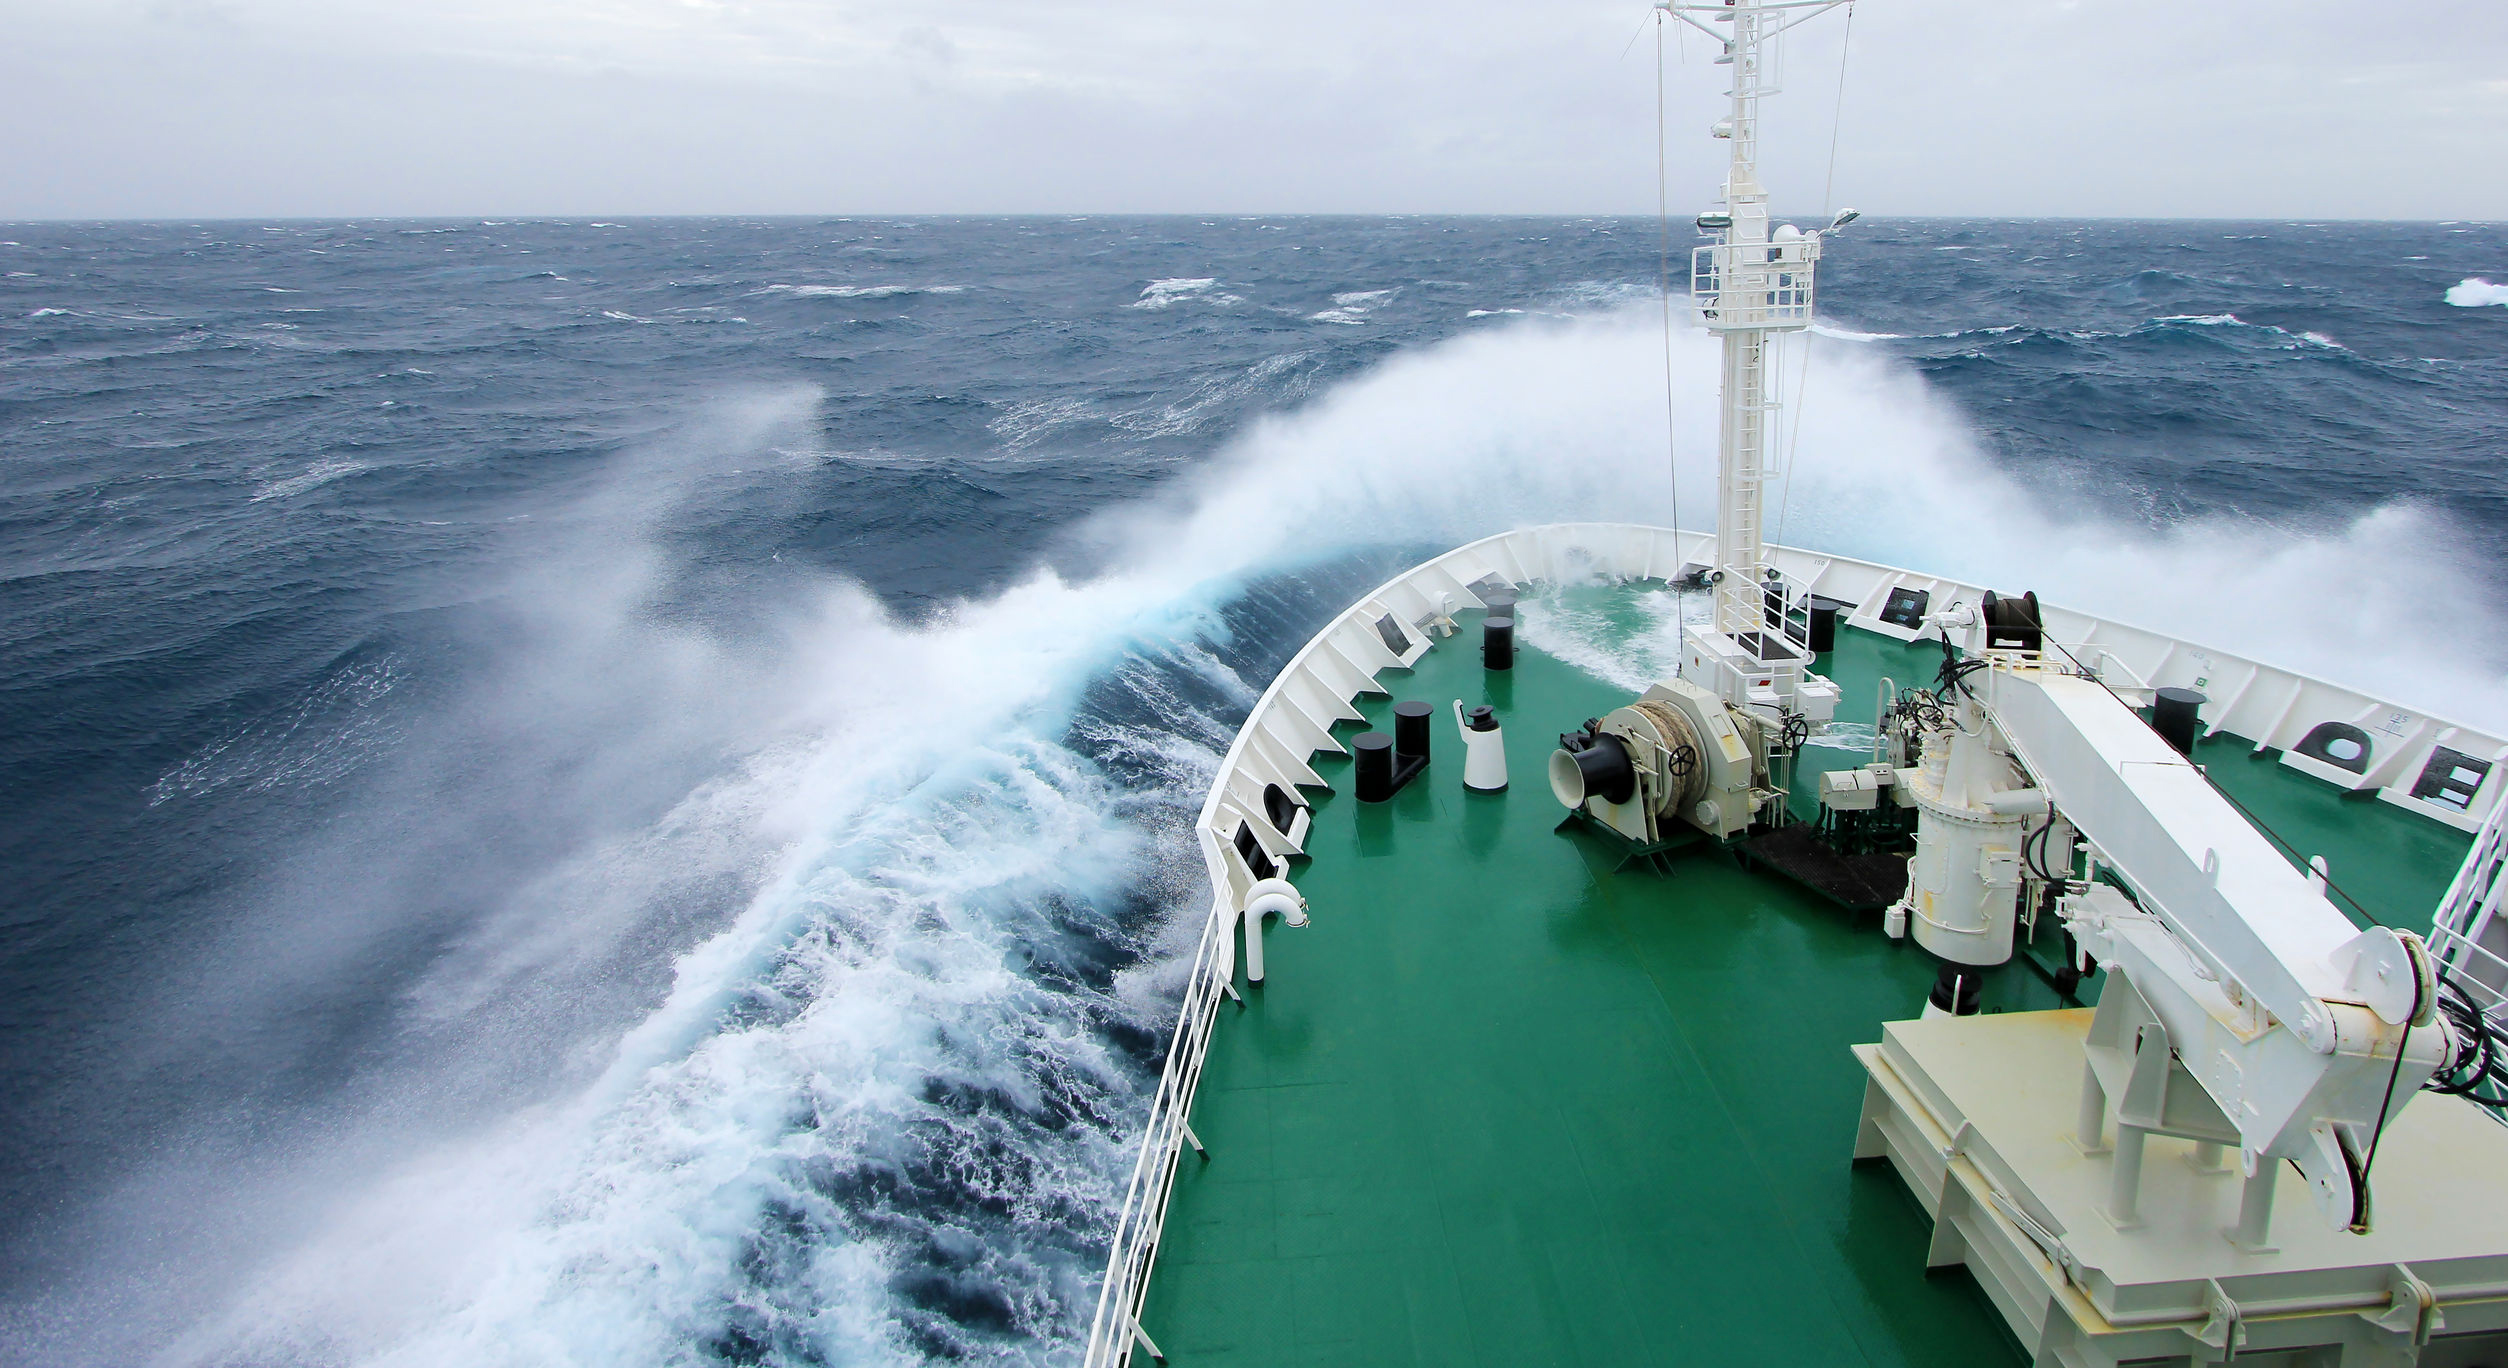 ship-bow-storm-wartsila-shaft-line-repair-services